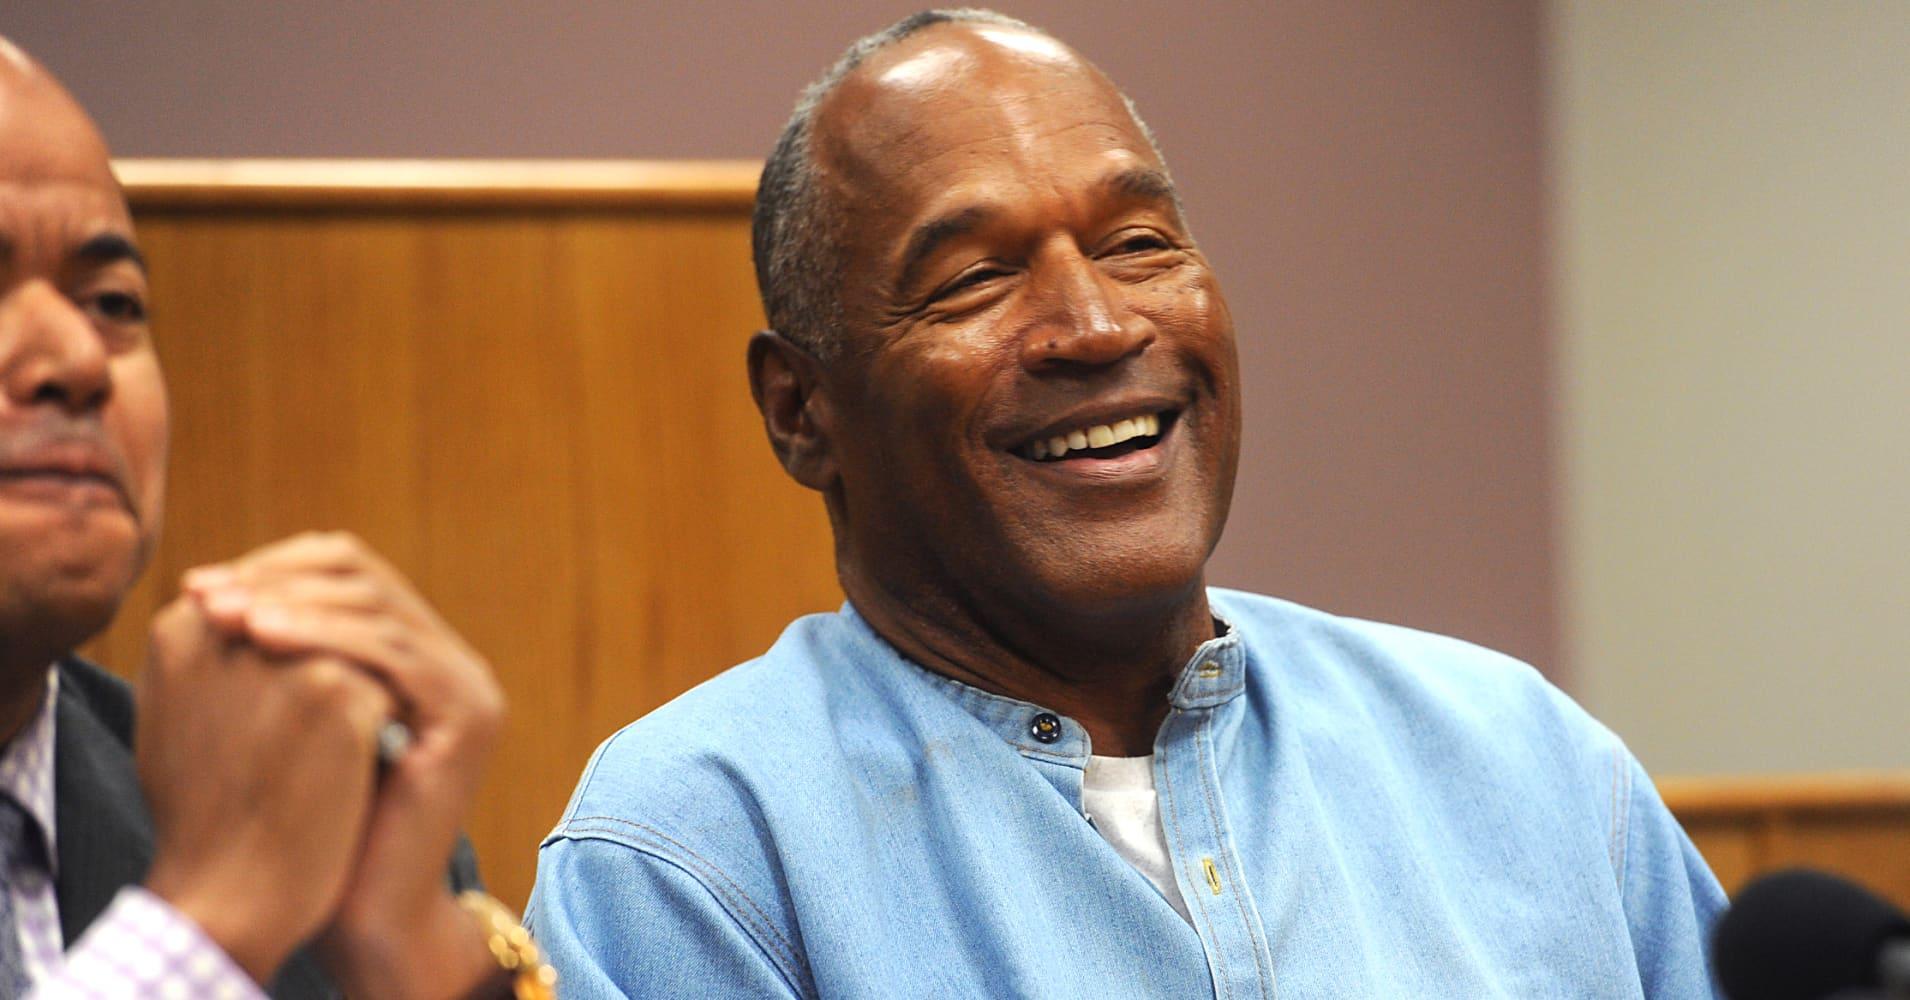 Nevada: OJ Simpson Released From Prison - Gazette Review